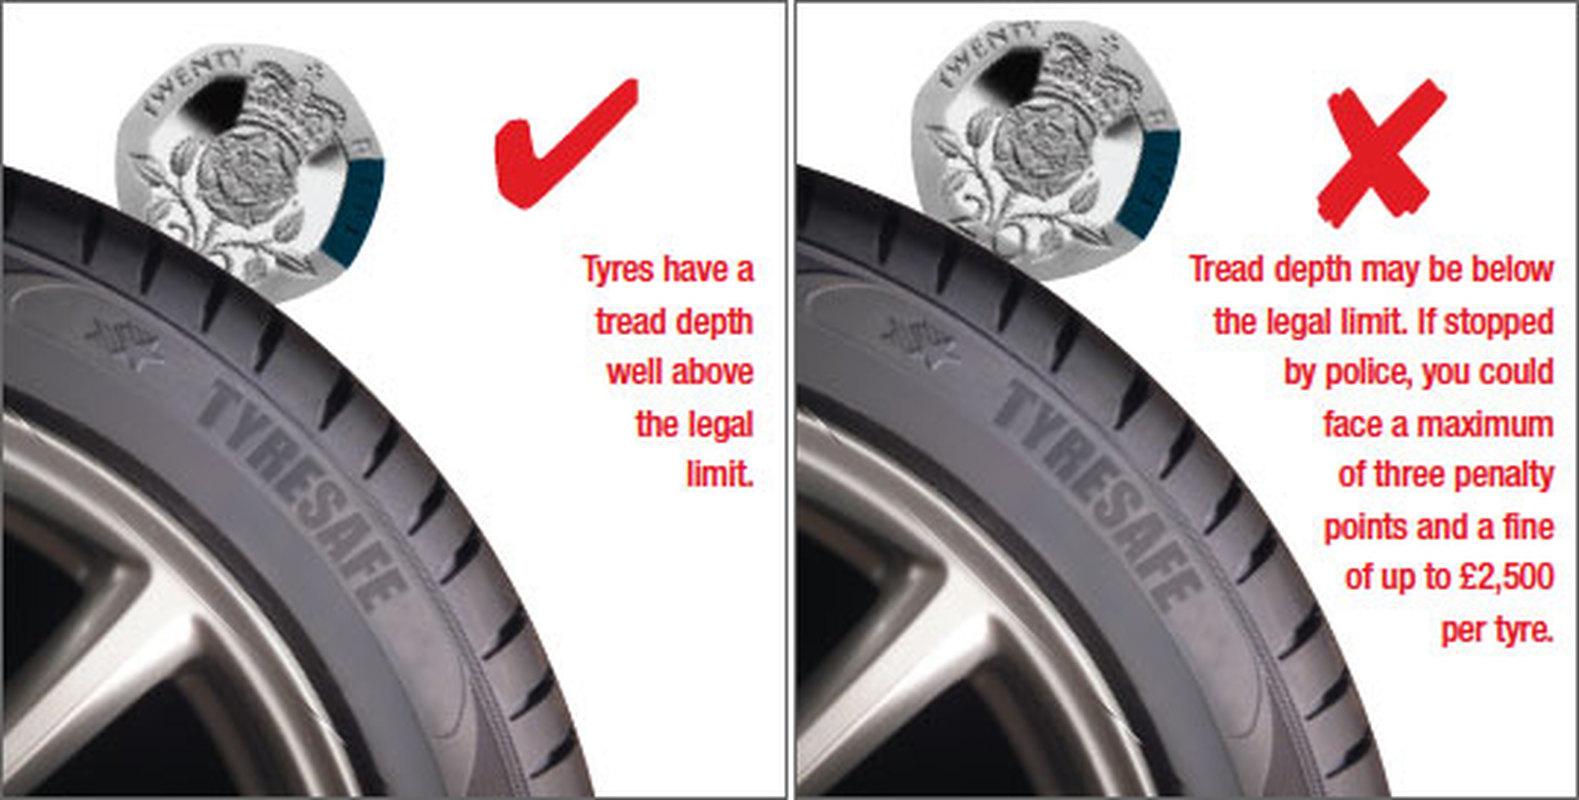 Tyre tread depth